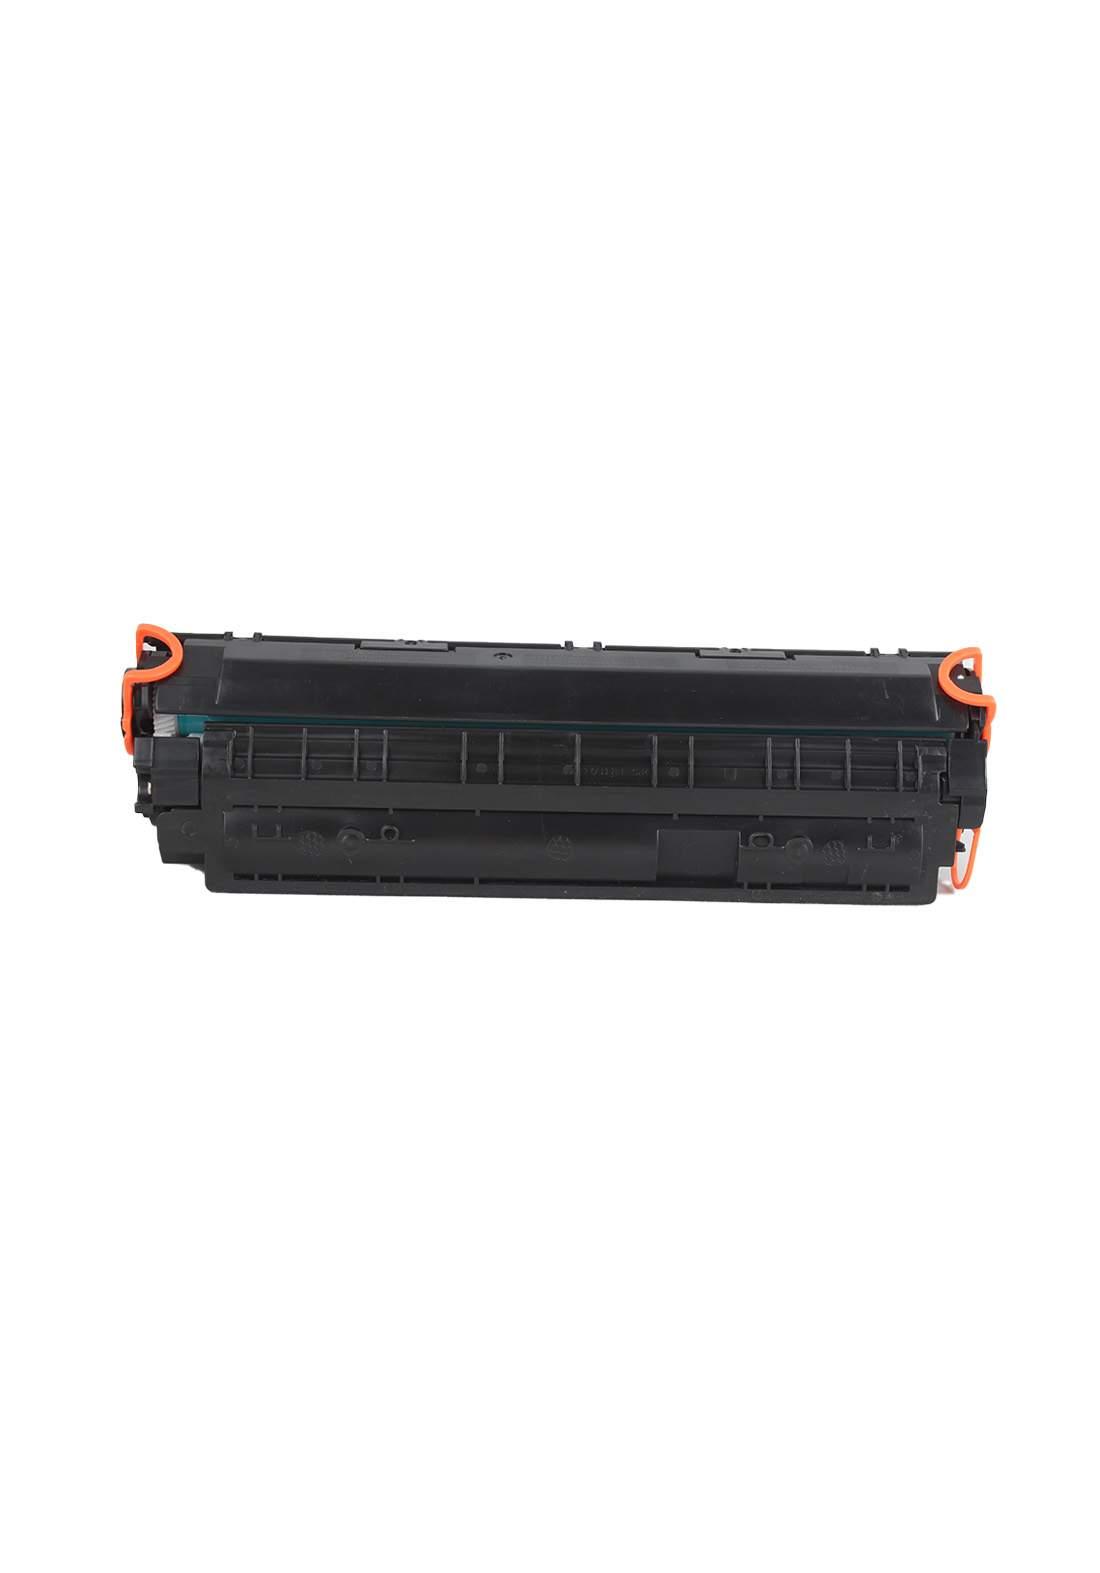 Super Power Plus CRG737/CRG 37/283X Laser Printer Toner Cartridge خرطوشة حبر